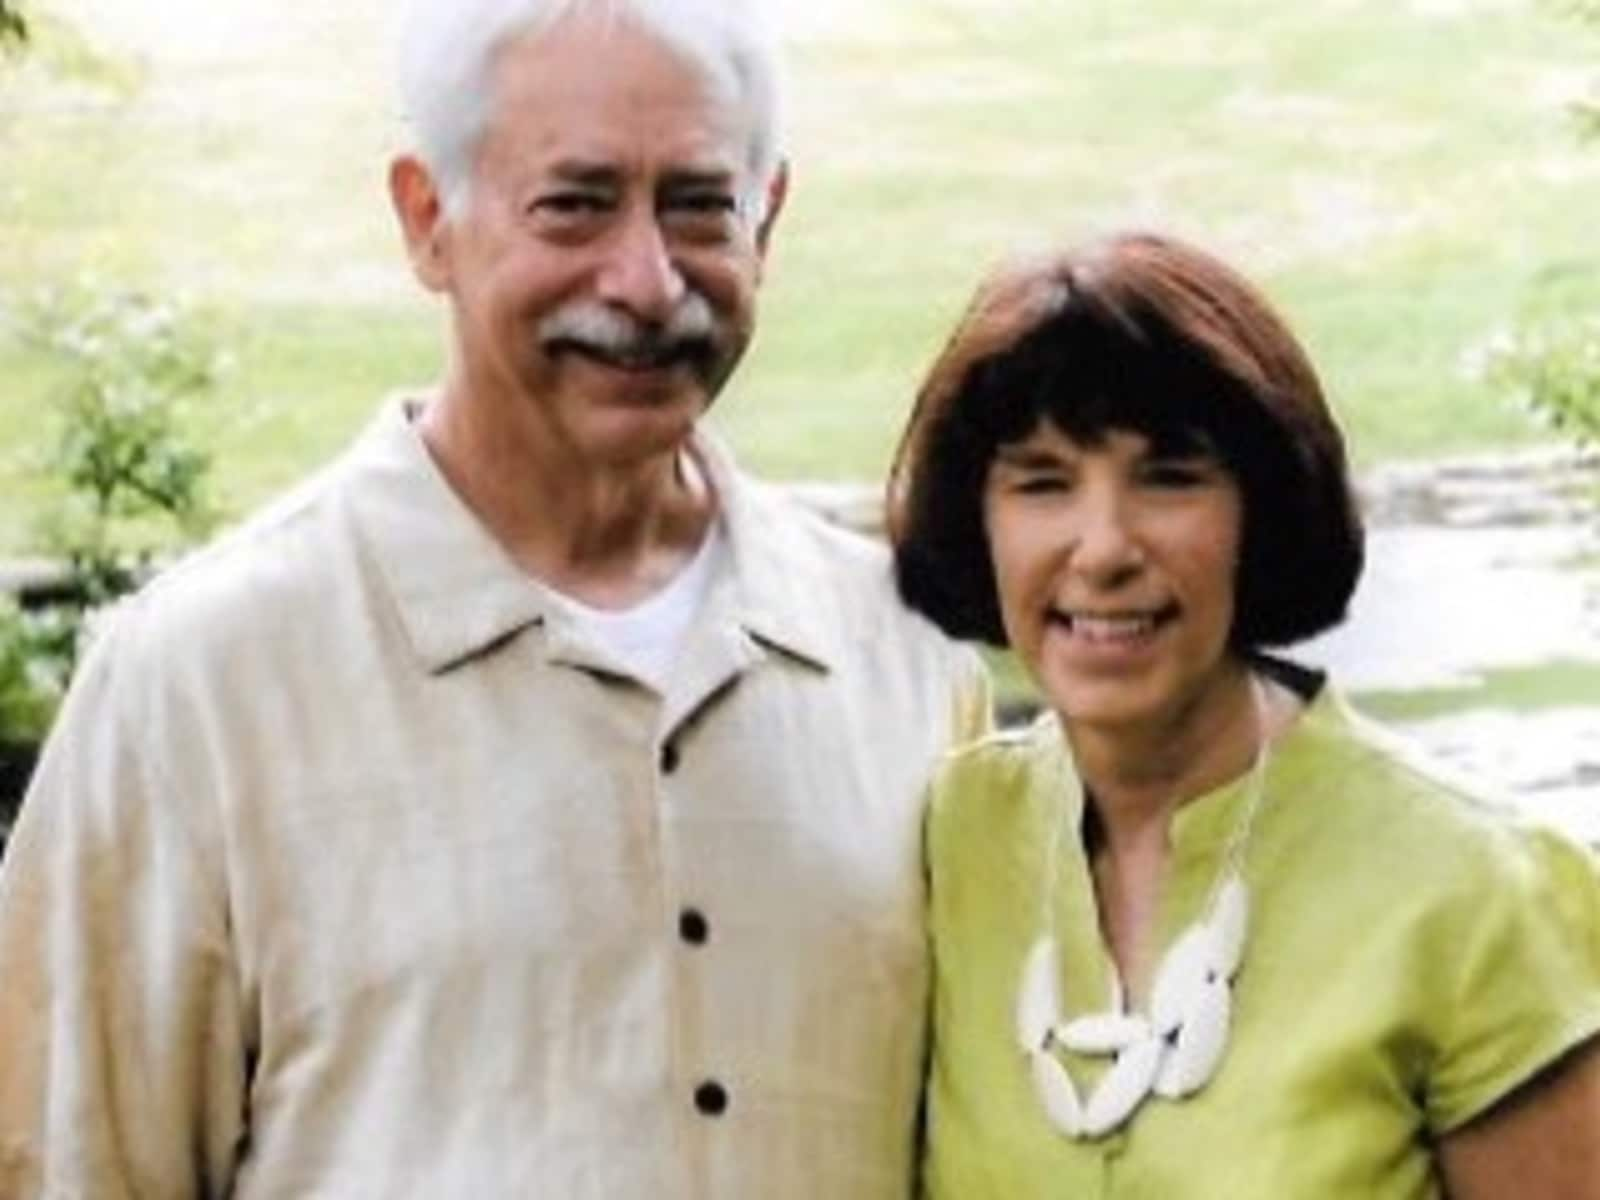 Linda & Ken from Mobile, Alabama, United States